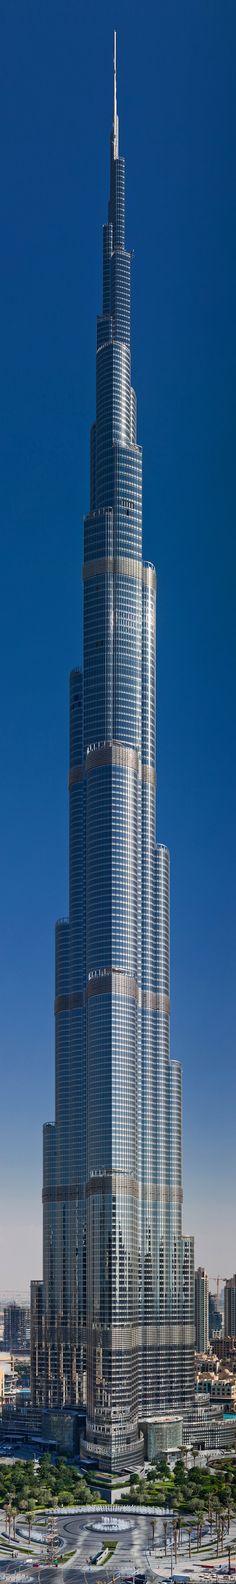 "Burj Khalifa skyscraper - Dubai - United Arab Emirates - Burj Khalifa (Arabic: برج خليفة, ""Khalifa tower""), known as Burj Dubai prior to its inauguration, is a skyscraper in Dubai, United Arab Emirates, and is the tallest man-made structure in the world, at 829.8 m (2,722 ft)."